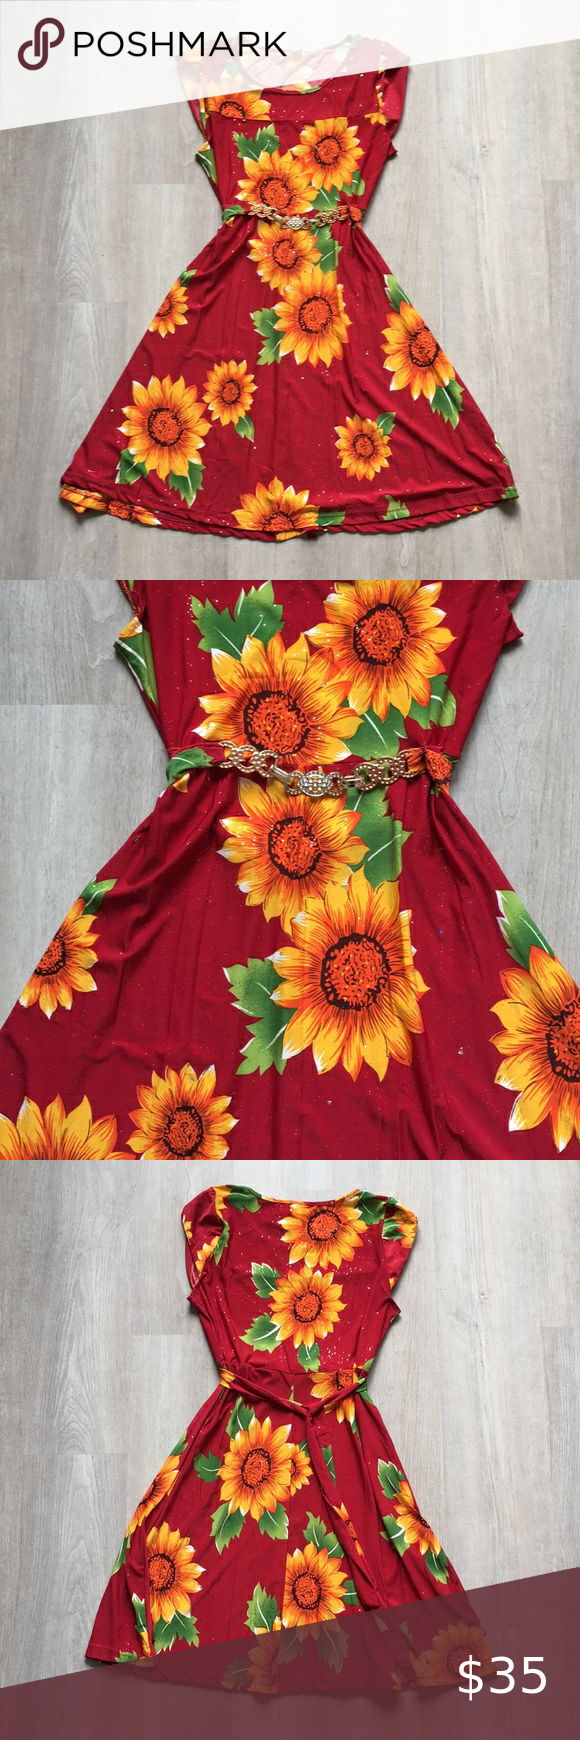 Red Sunflower Dress In 2021 Zebra Print Maxi Dress Red Sunflowers Sunflower Dress [ 1740 x 580 Pixel ]